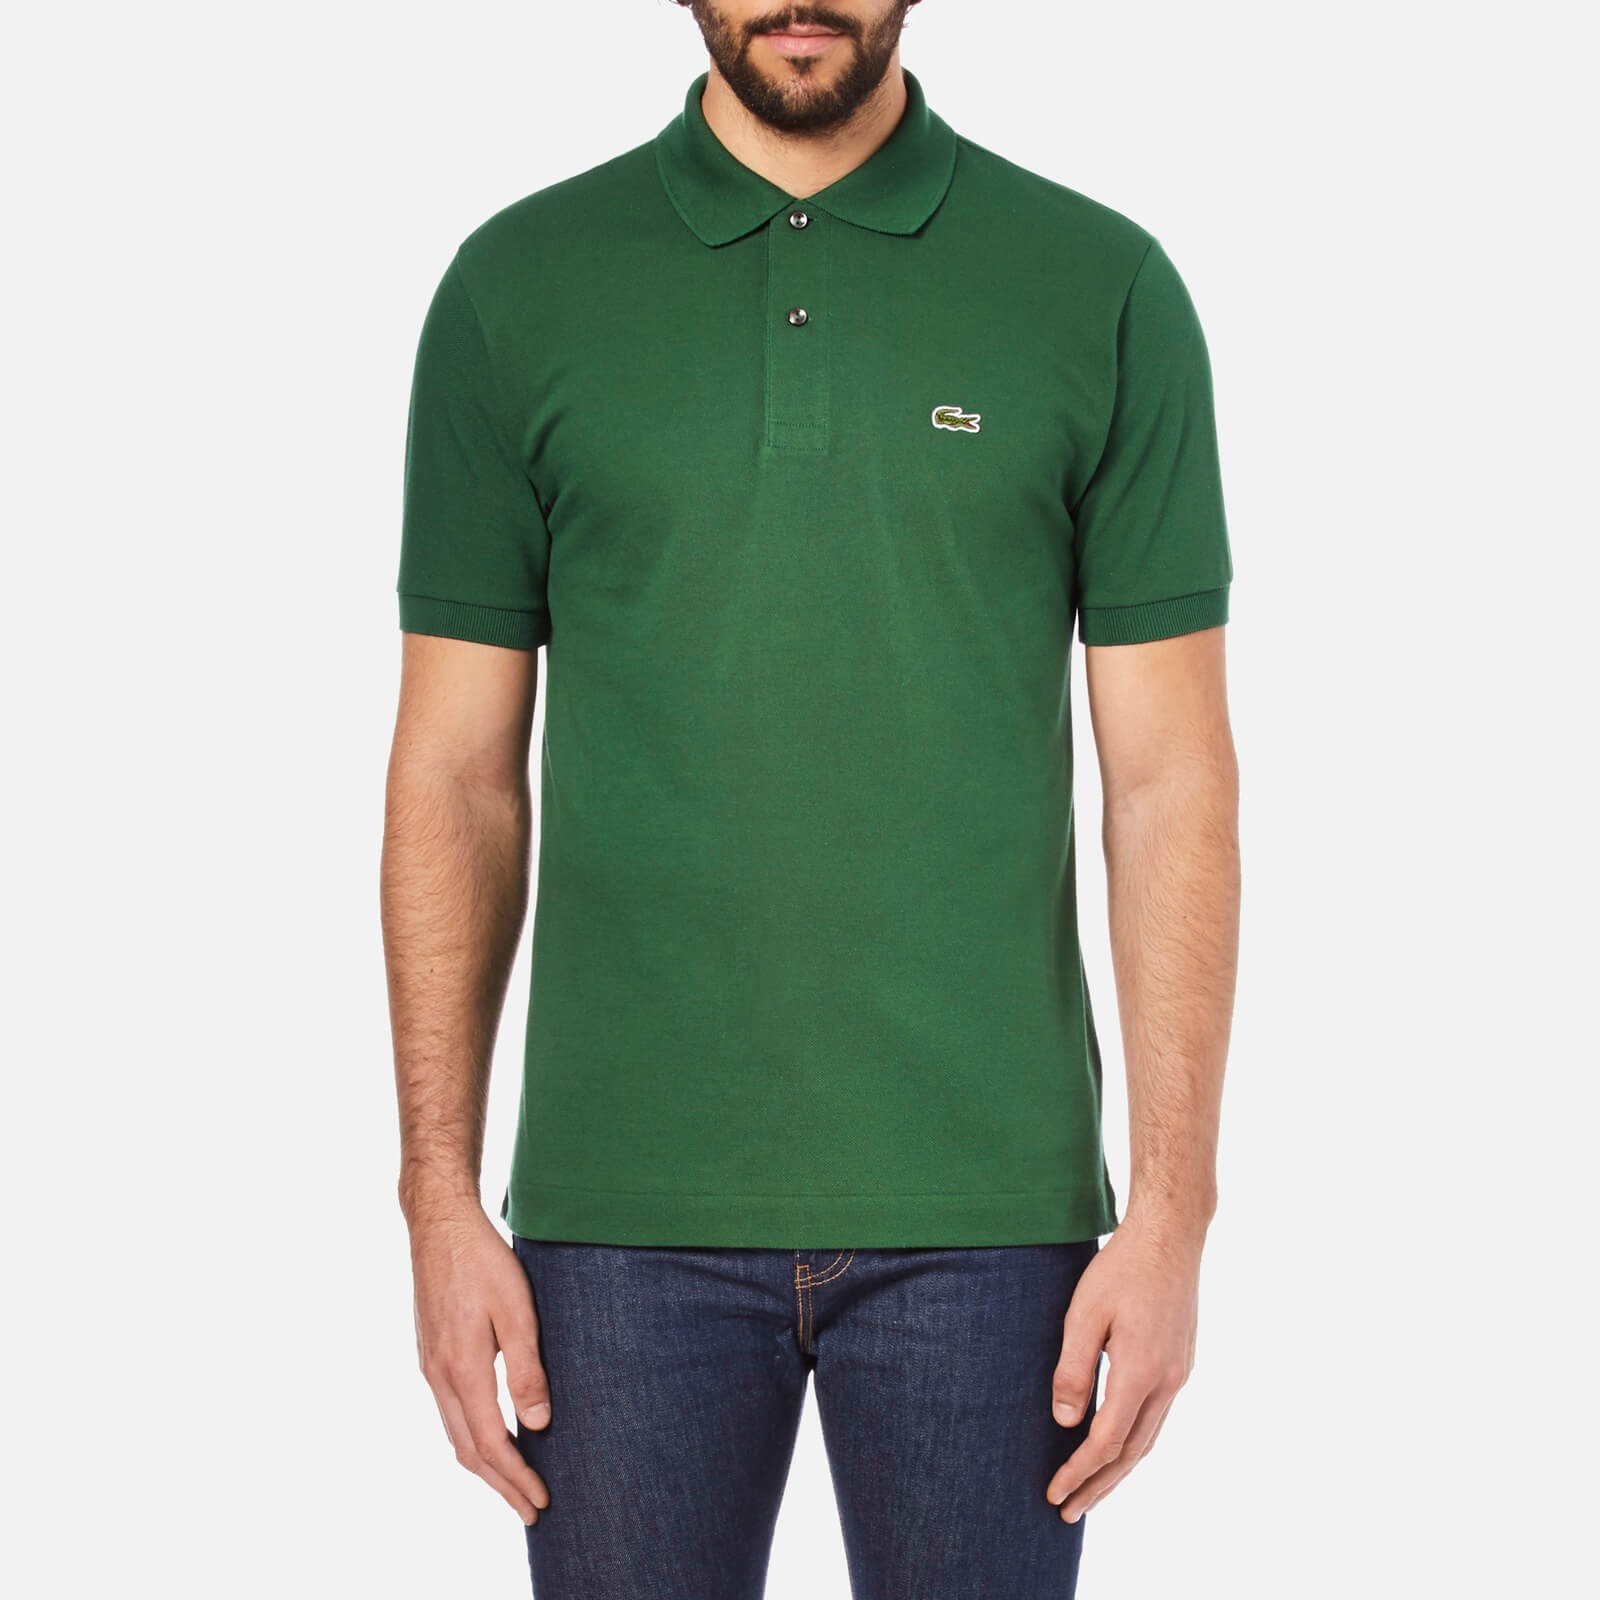 20294a70 Lacoste Men's Short Sleeve Pique Polo Shirt - Chlorophyll